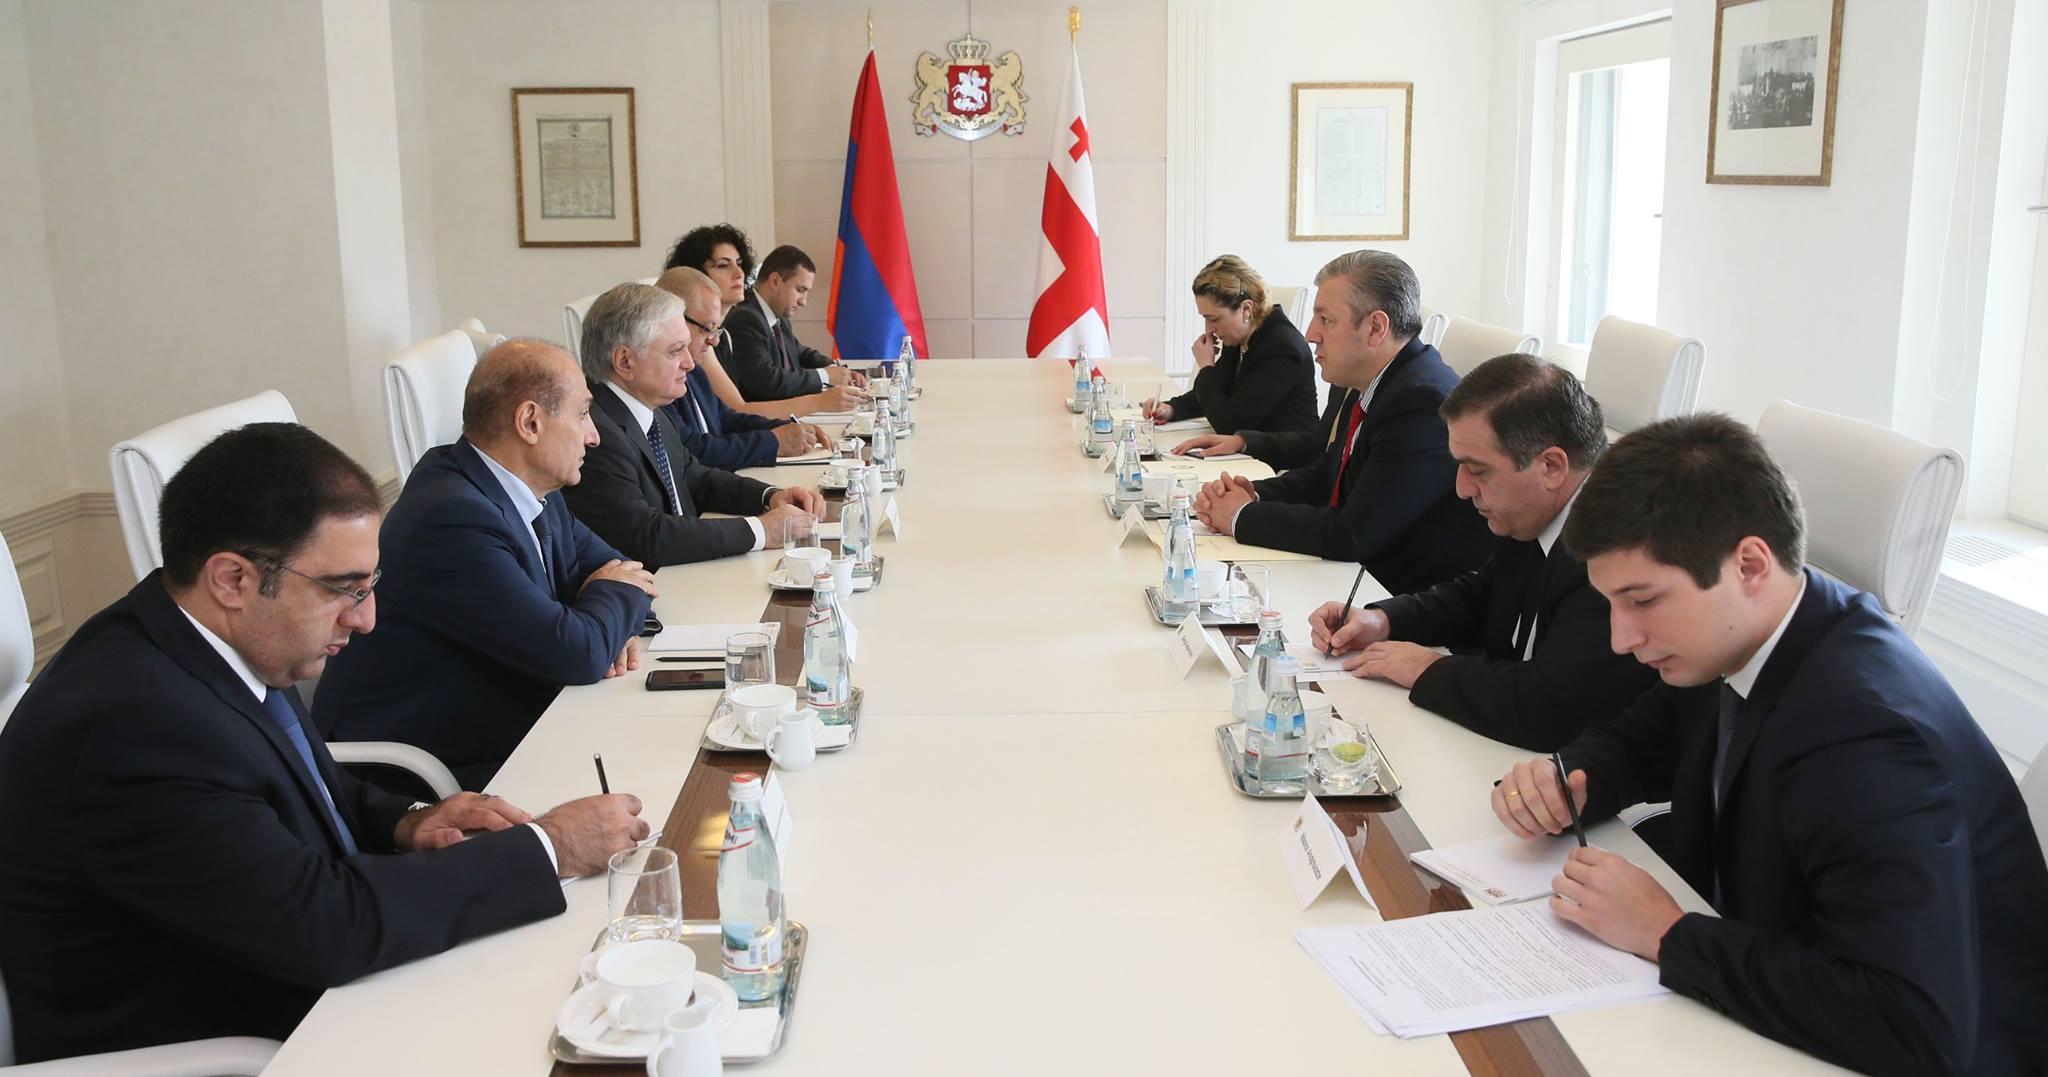 Глава МИД Армении Эдвард Налбандян находится с визитом в Тбилиси